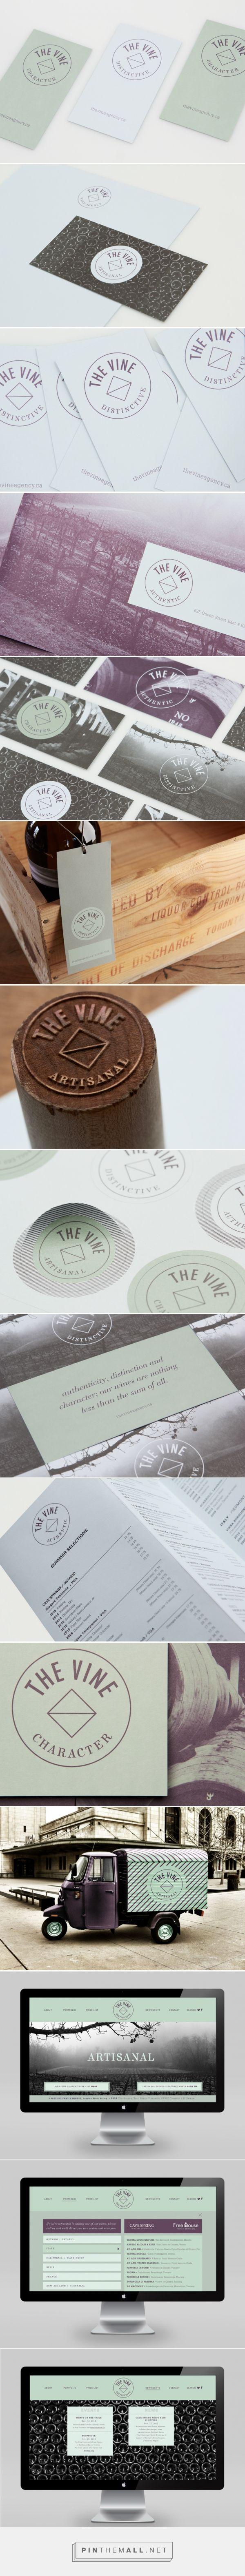 The Vine Wine Agency Branding by Blok | Fivestar Branding Agency – Design and Branding Agency & Curated Inspiration Gallery